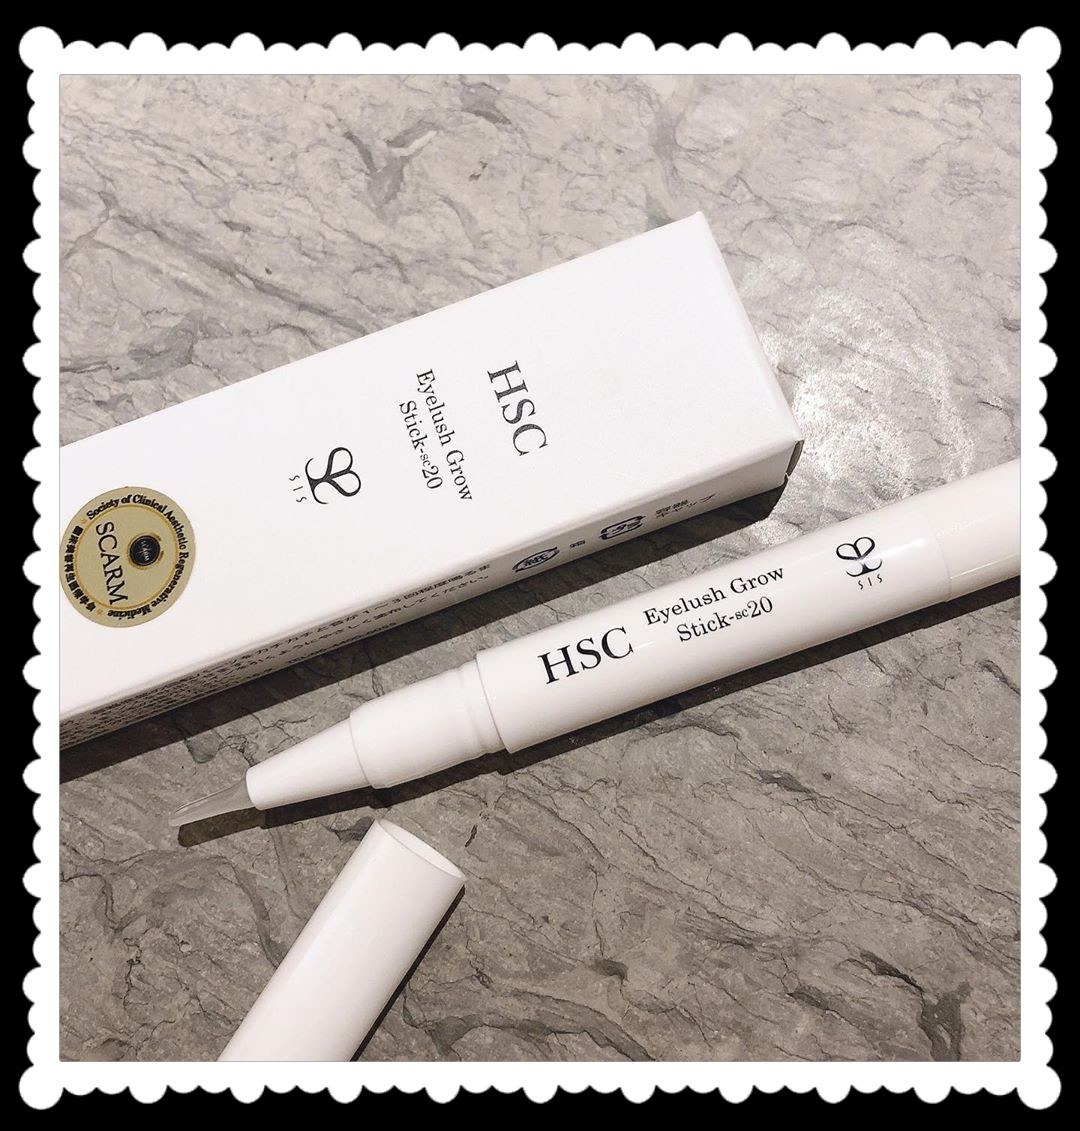 HSC Eyelush Grow Stick -sc20